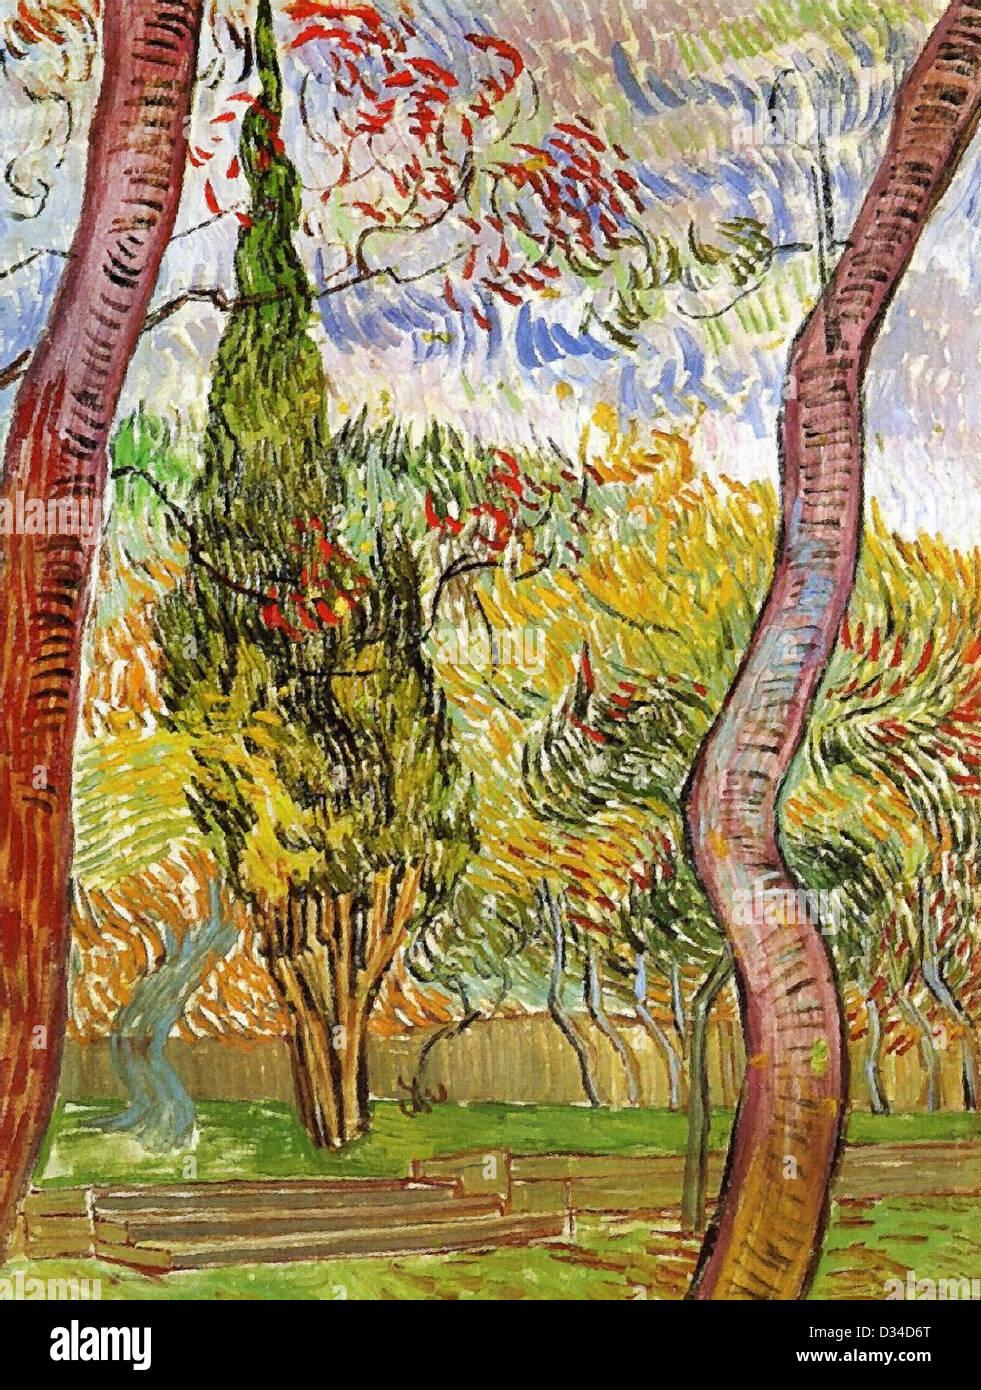 Vincent van Gogh, The Garden of Saint-Paul Hospital. 1889. Post-Impressionism. Oil on canvas. - Stock Image